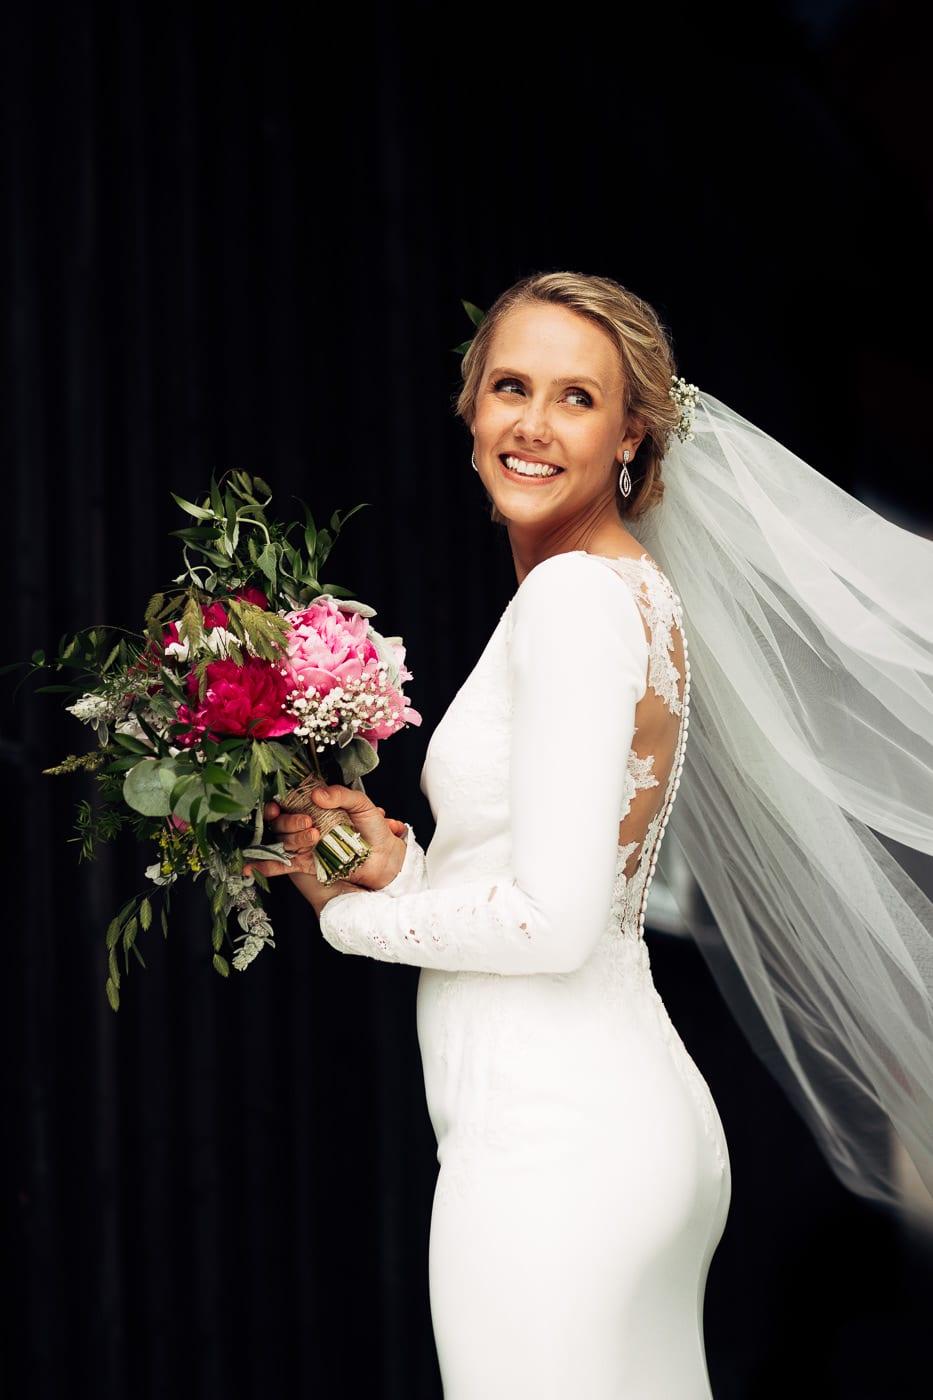 Karoline & Andreas - bryllup i Østfold med magiske detaljer Bryllup Fredrikstad Fotograf 37